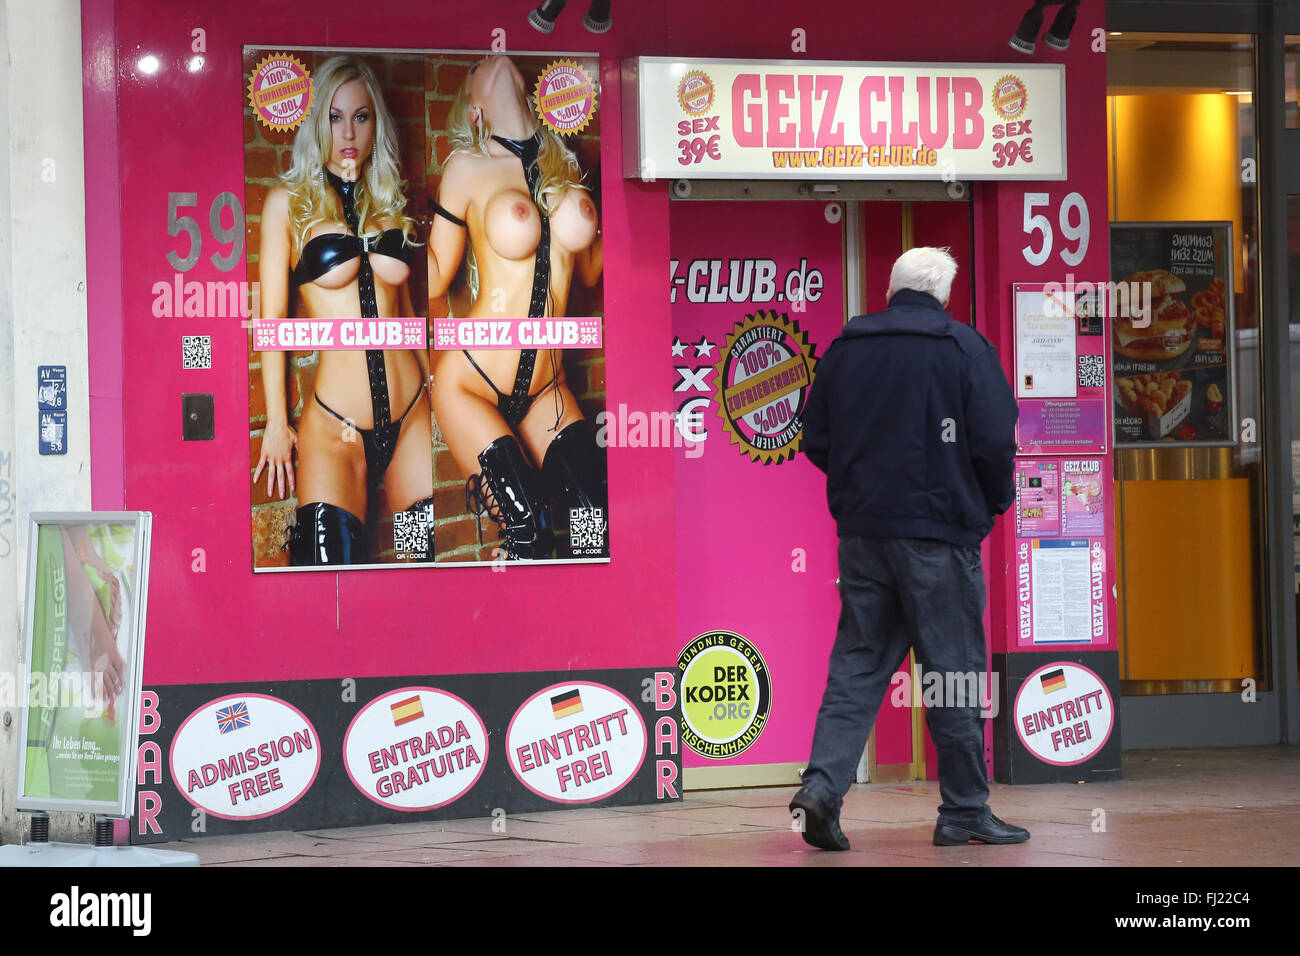 Sex hamburg